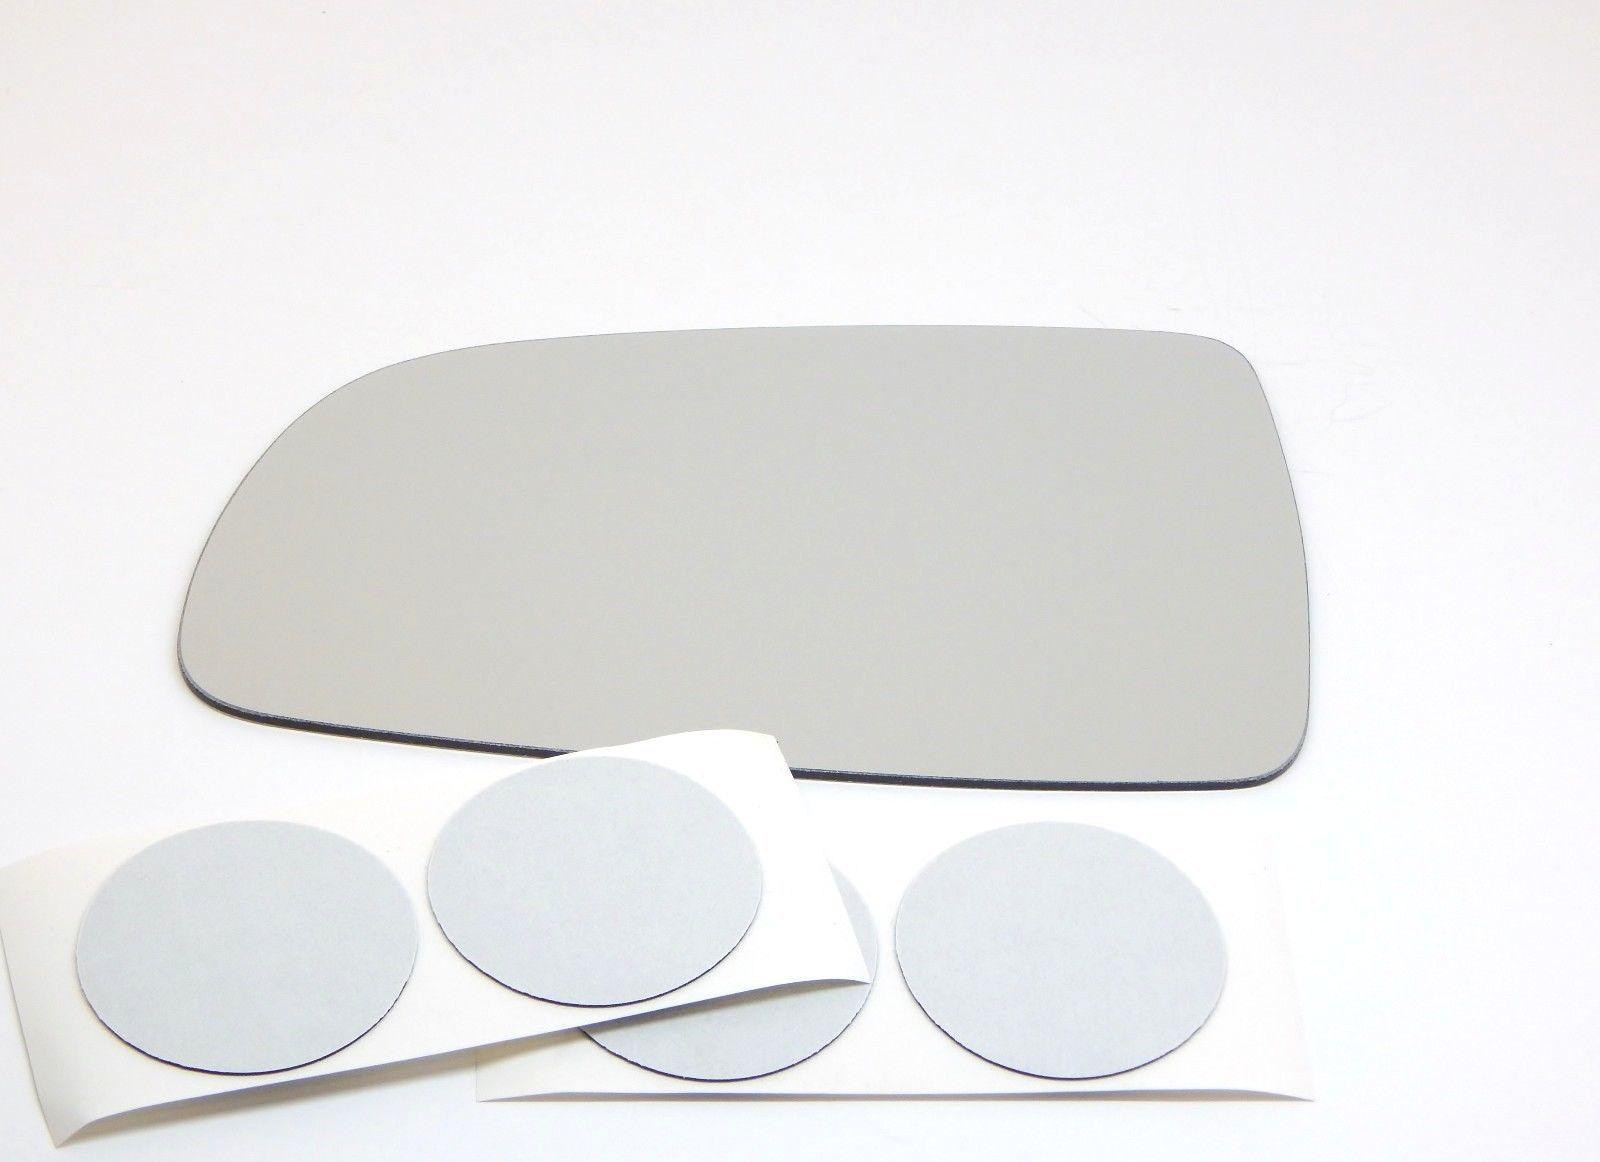 07-11 Aveo, Wave, Swift Sedan Left Driver Mirror Glass Lens w/Adhesive USA